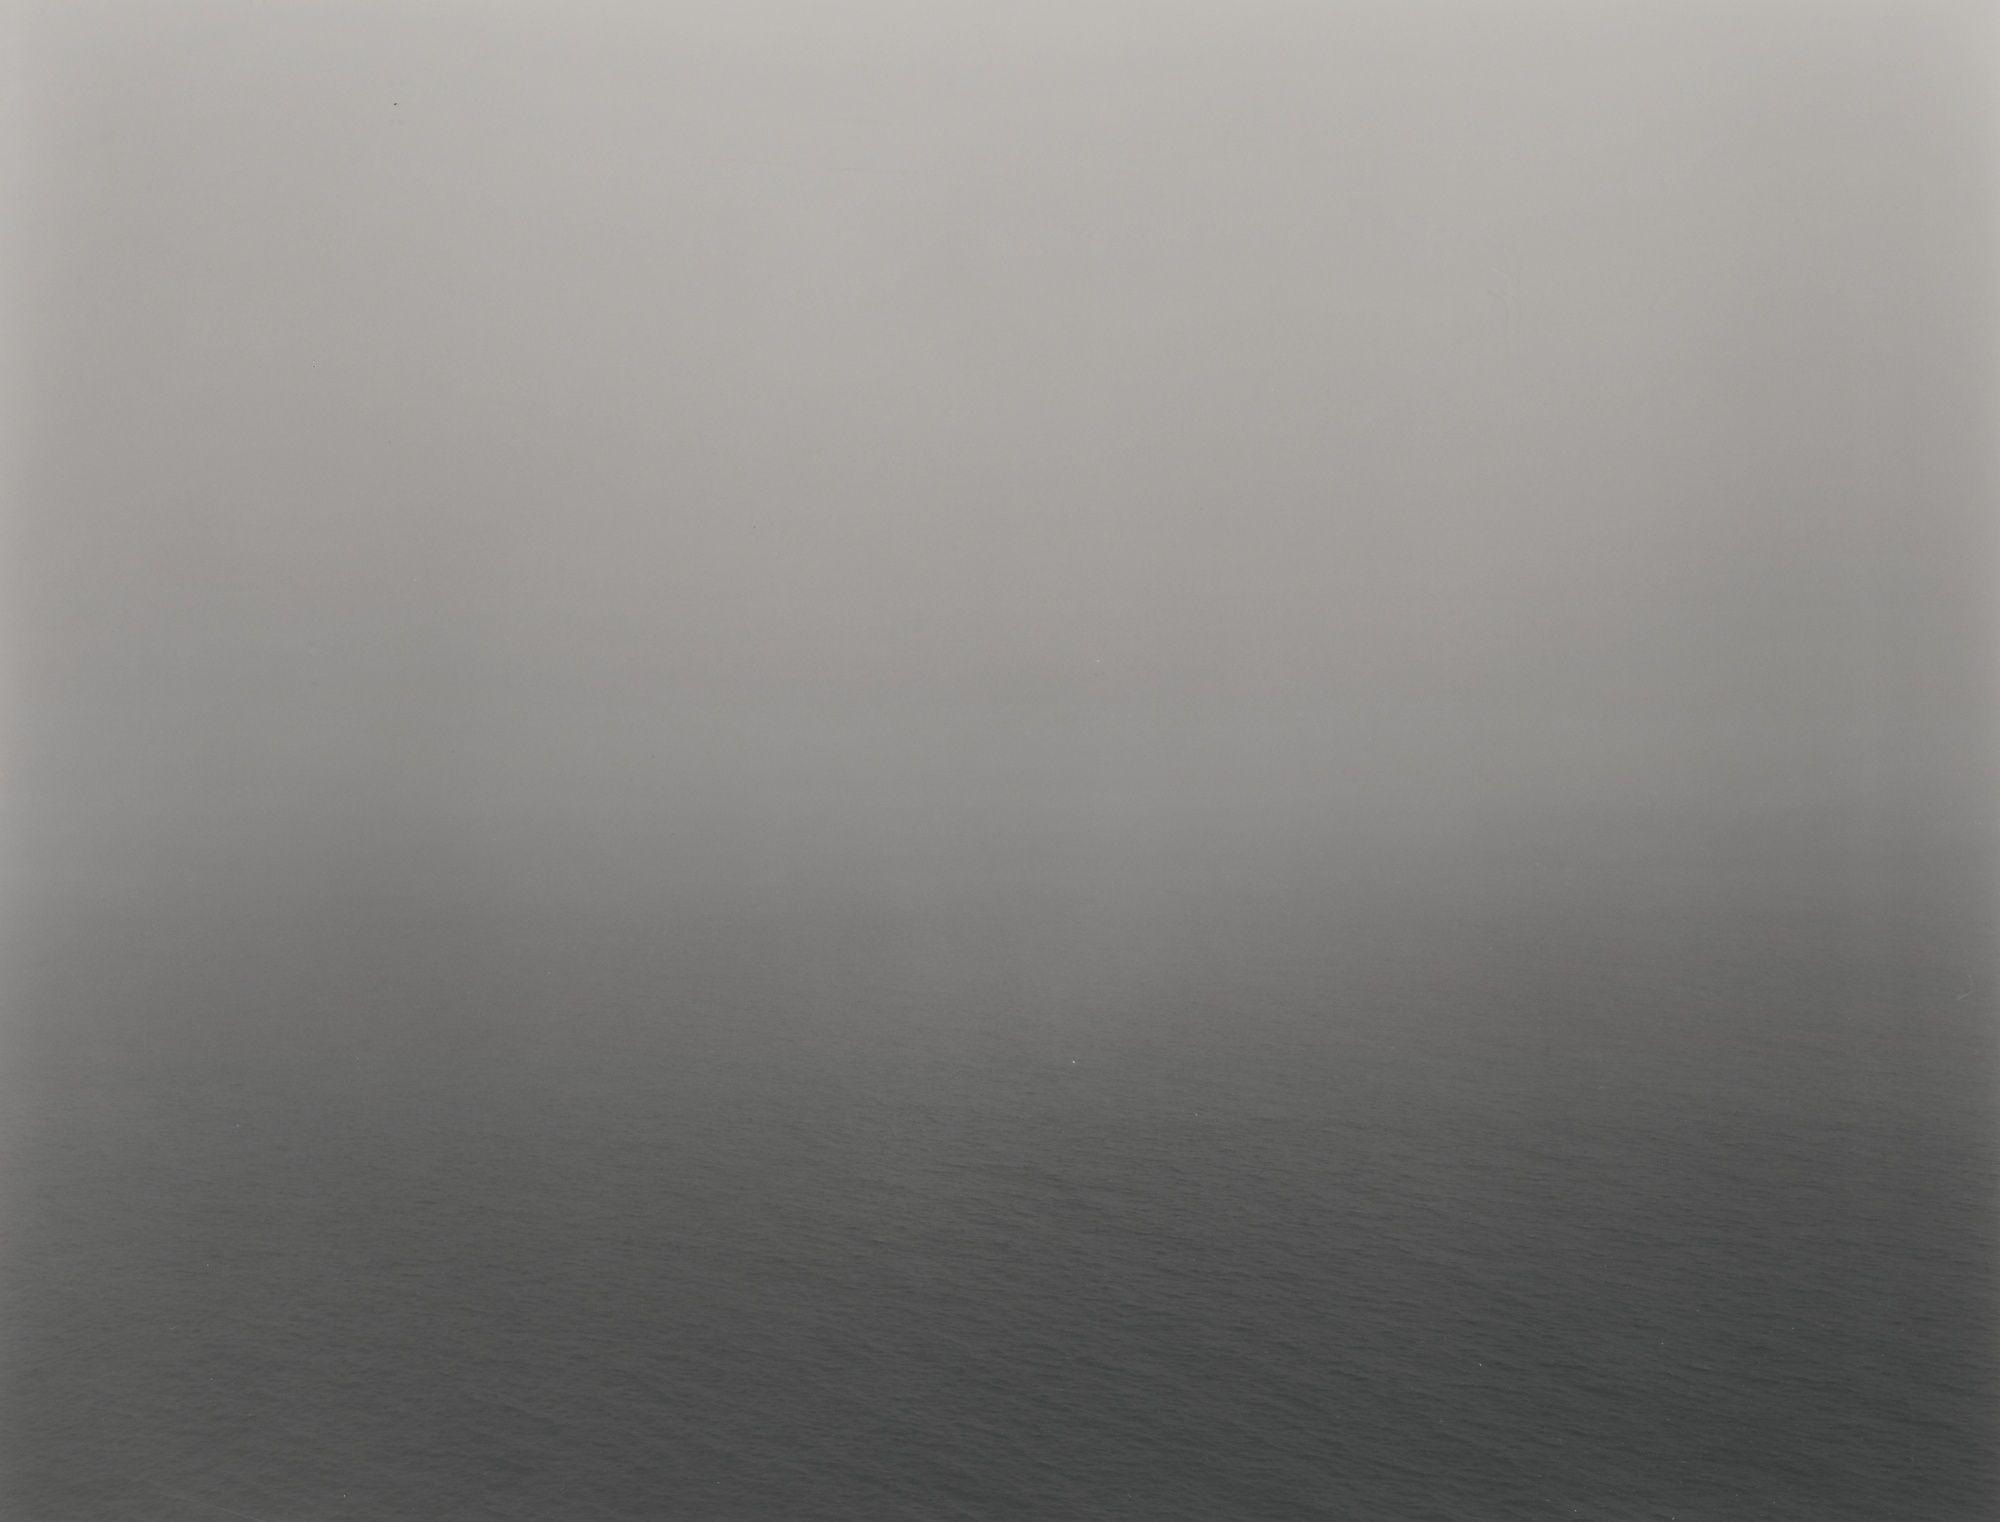 Hiroshi Sugimoto   NORTH PACIFIC OCEAN, MT. TAMALPAIS'   Sotheby's